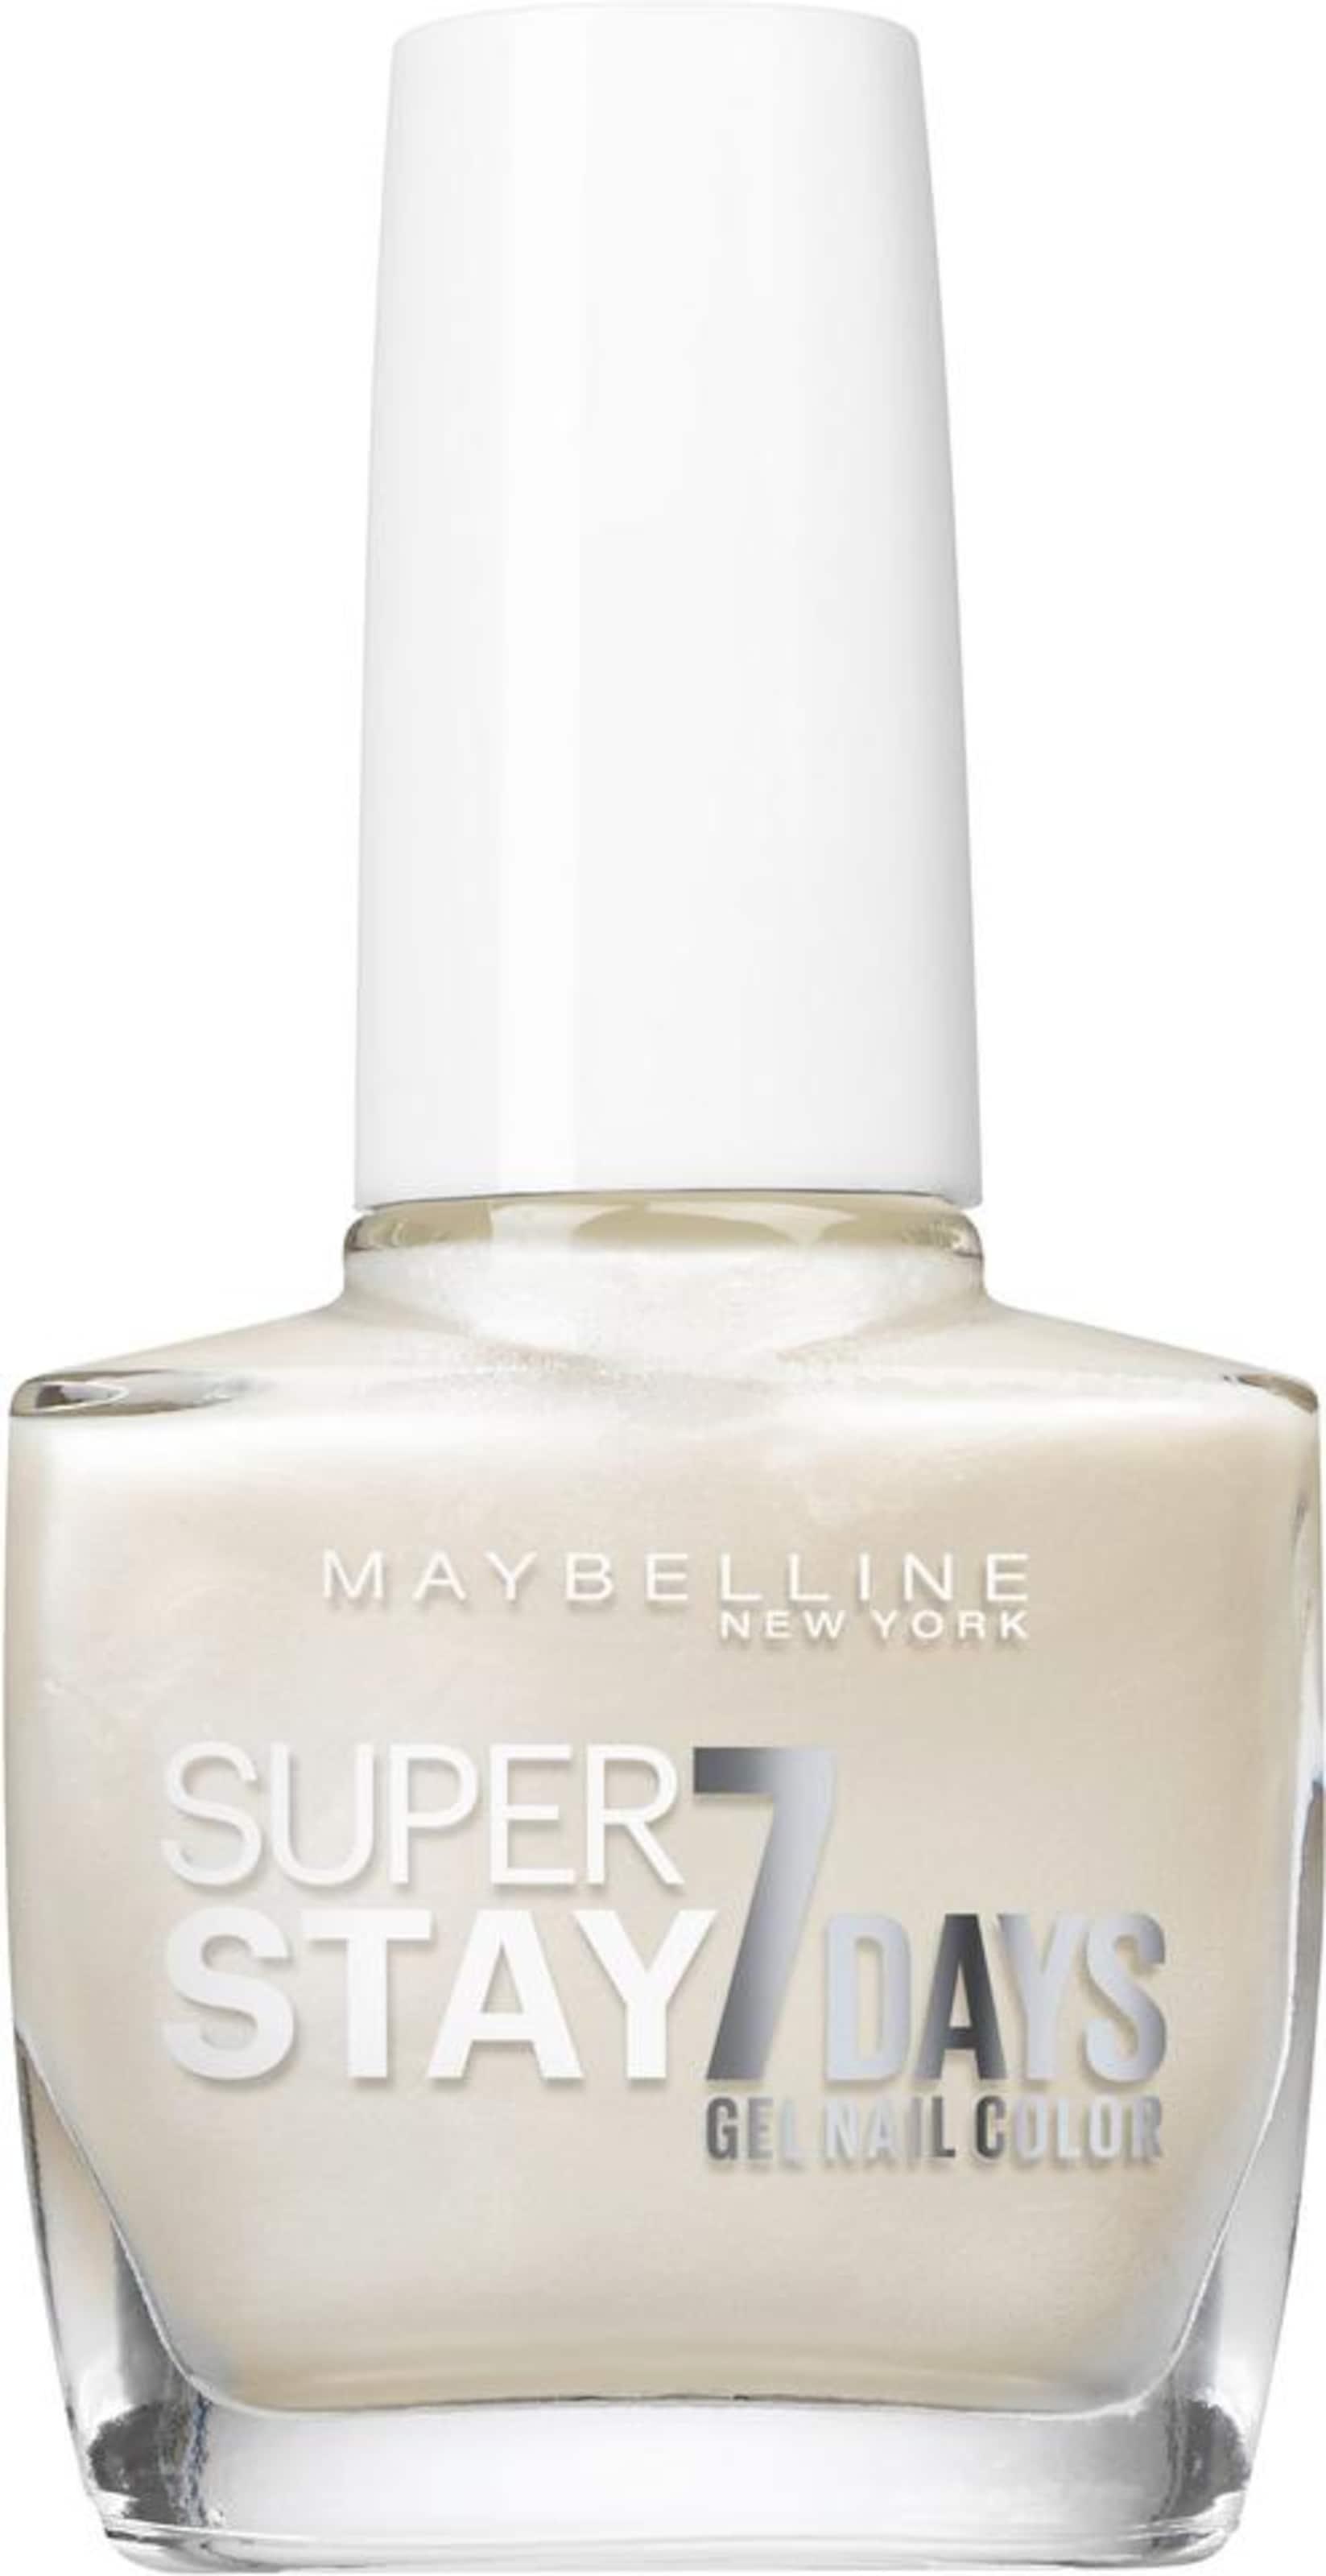 Superstay New 'nagellack 7 Maybelline Days Nagellack In York ' Perlweiß JK1lFc